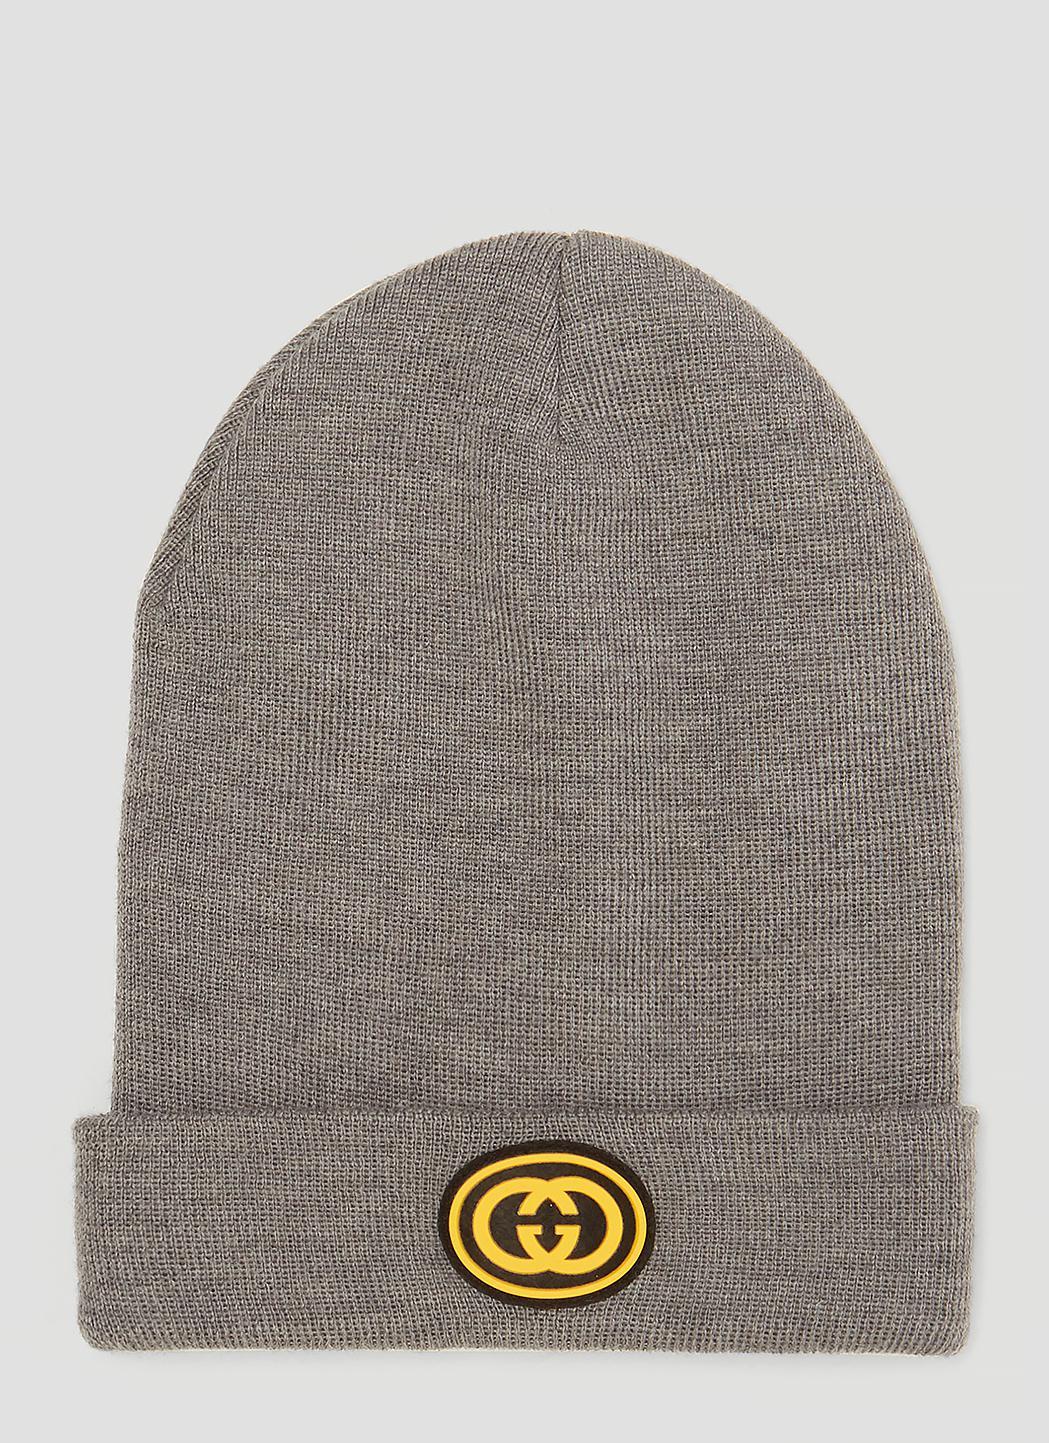 51cd4c0f43a14 Gucci Sf Giants Hat In Grey in Gray - Lyst